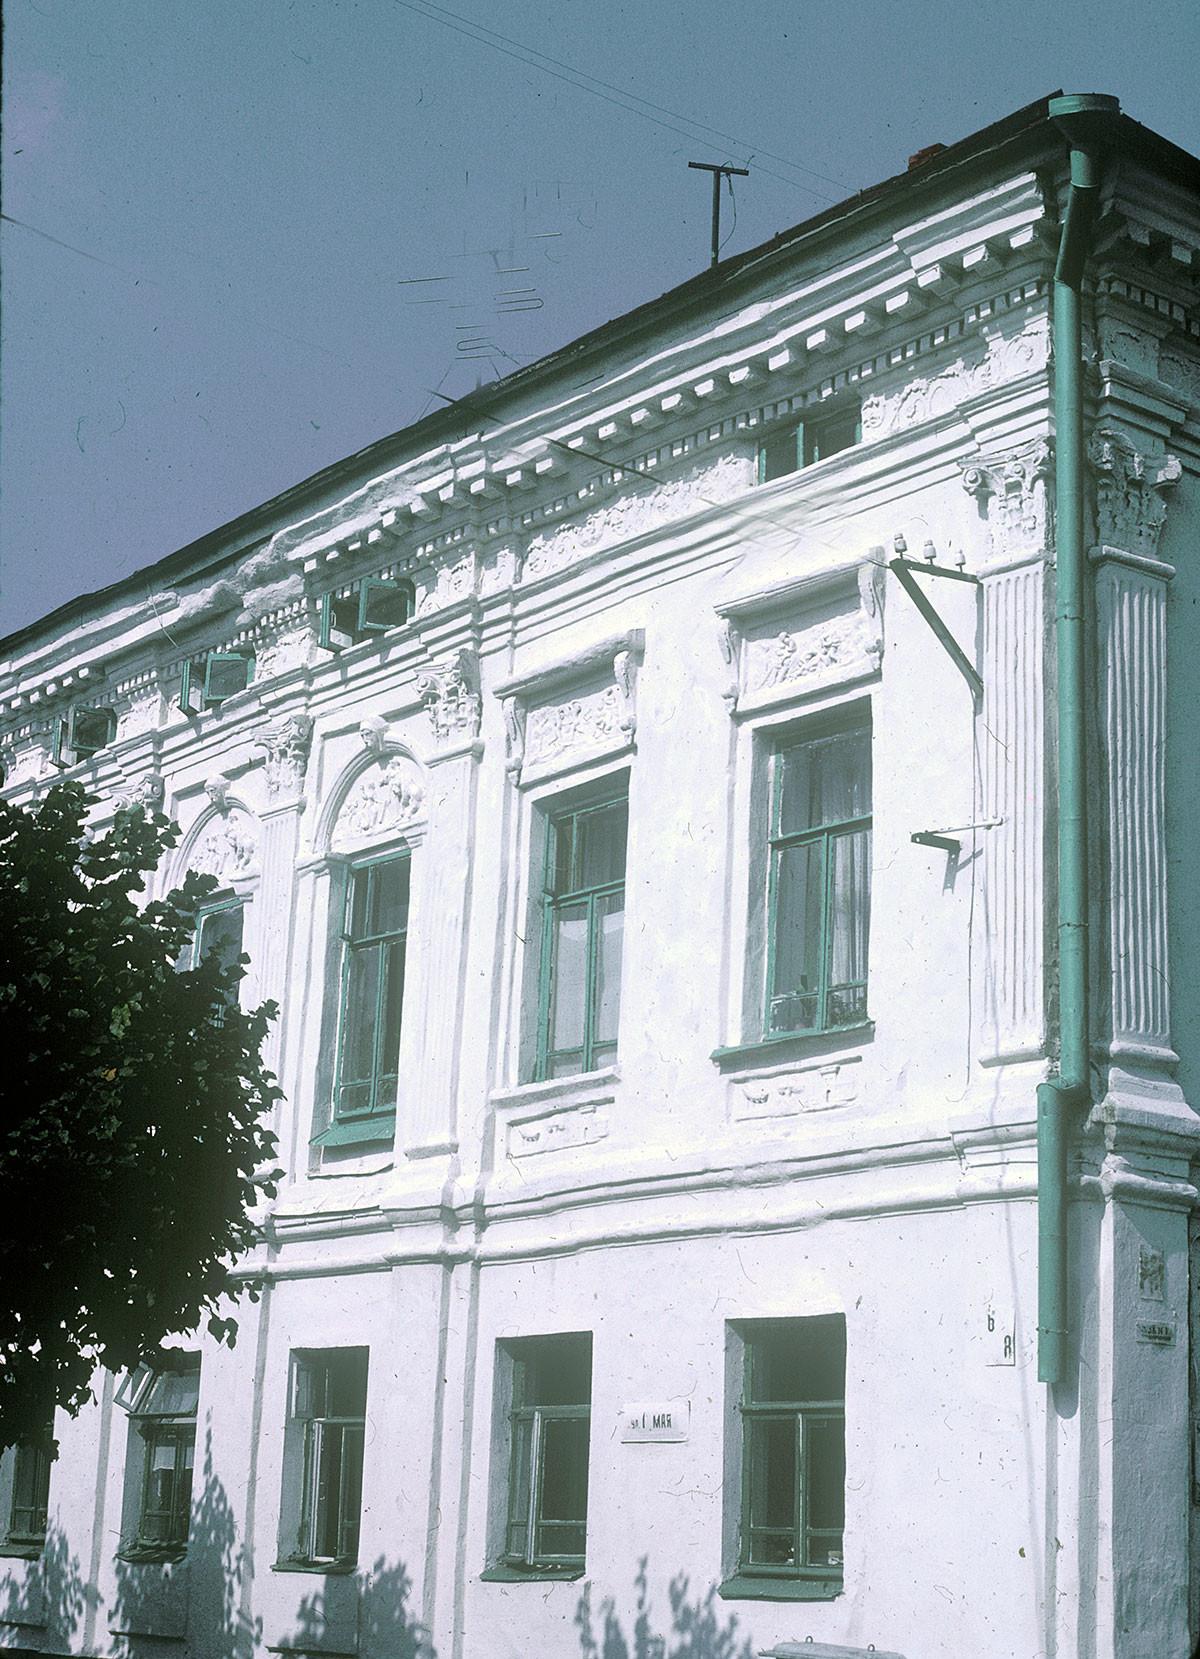 Hiša Strigaleva. Ulica Mlečni hrib (Moločnaja gora). Fasada na ulici 1. maja. 22. avgust 1988